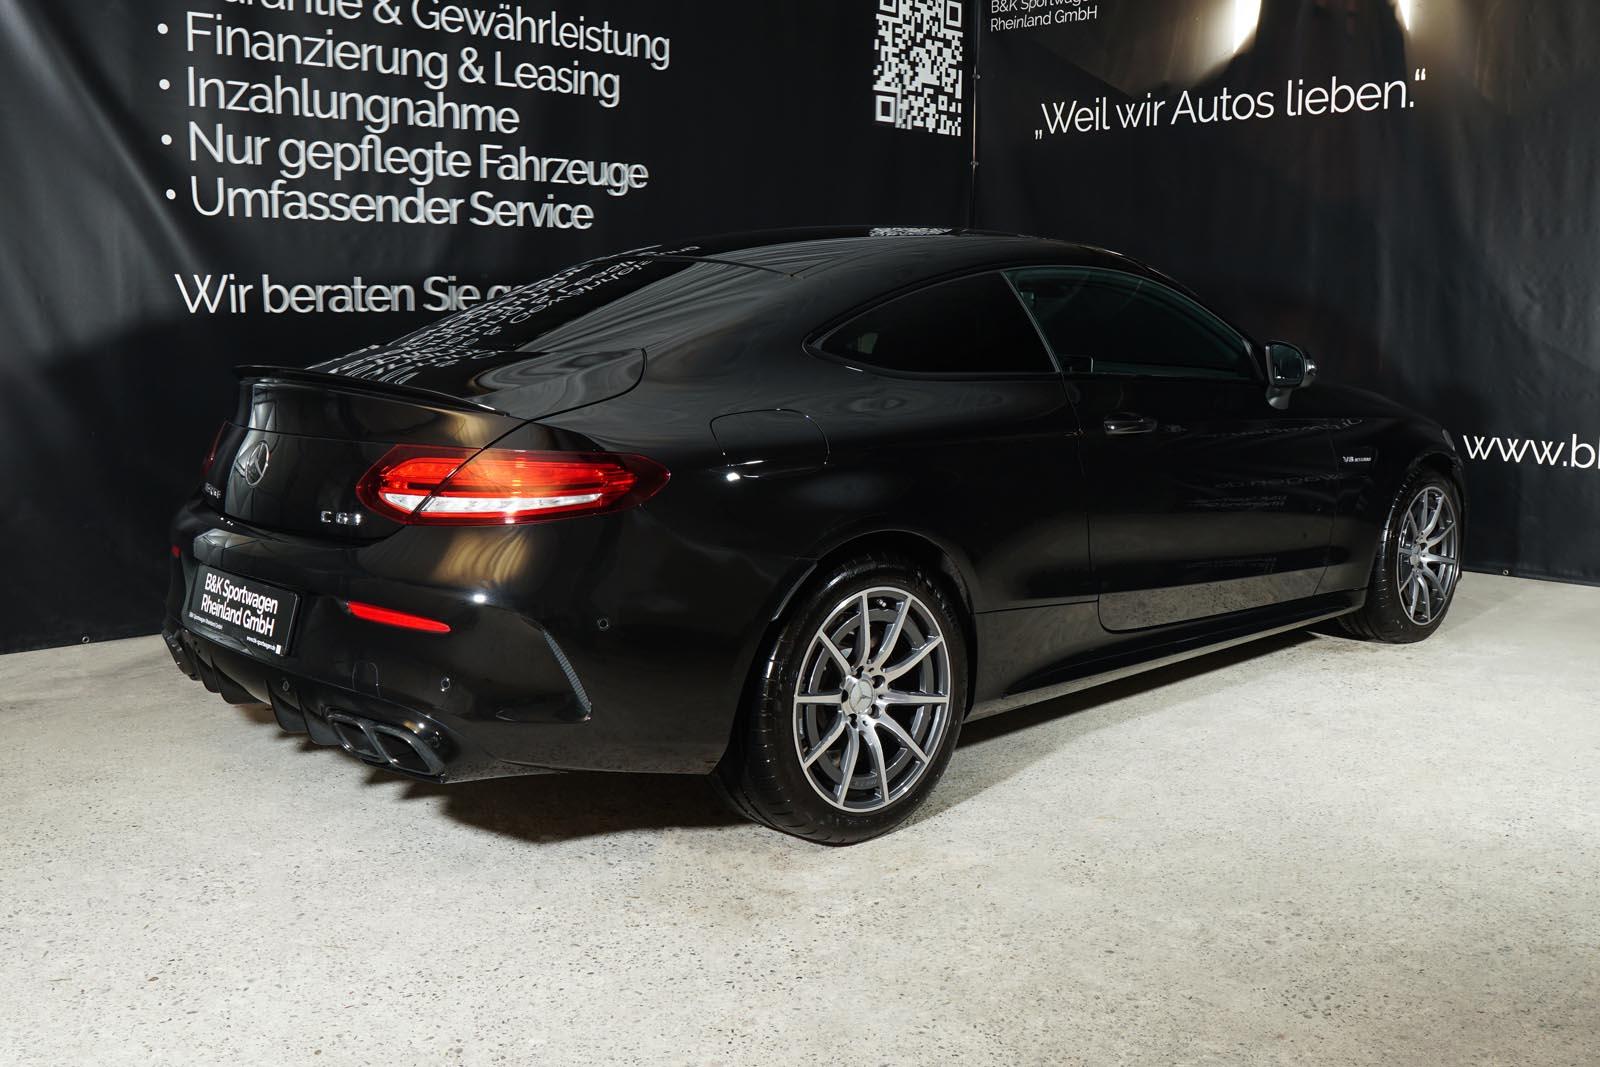 11mercedes-benz-c63-s-amg-coupe-schwarz_2